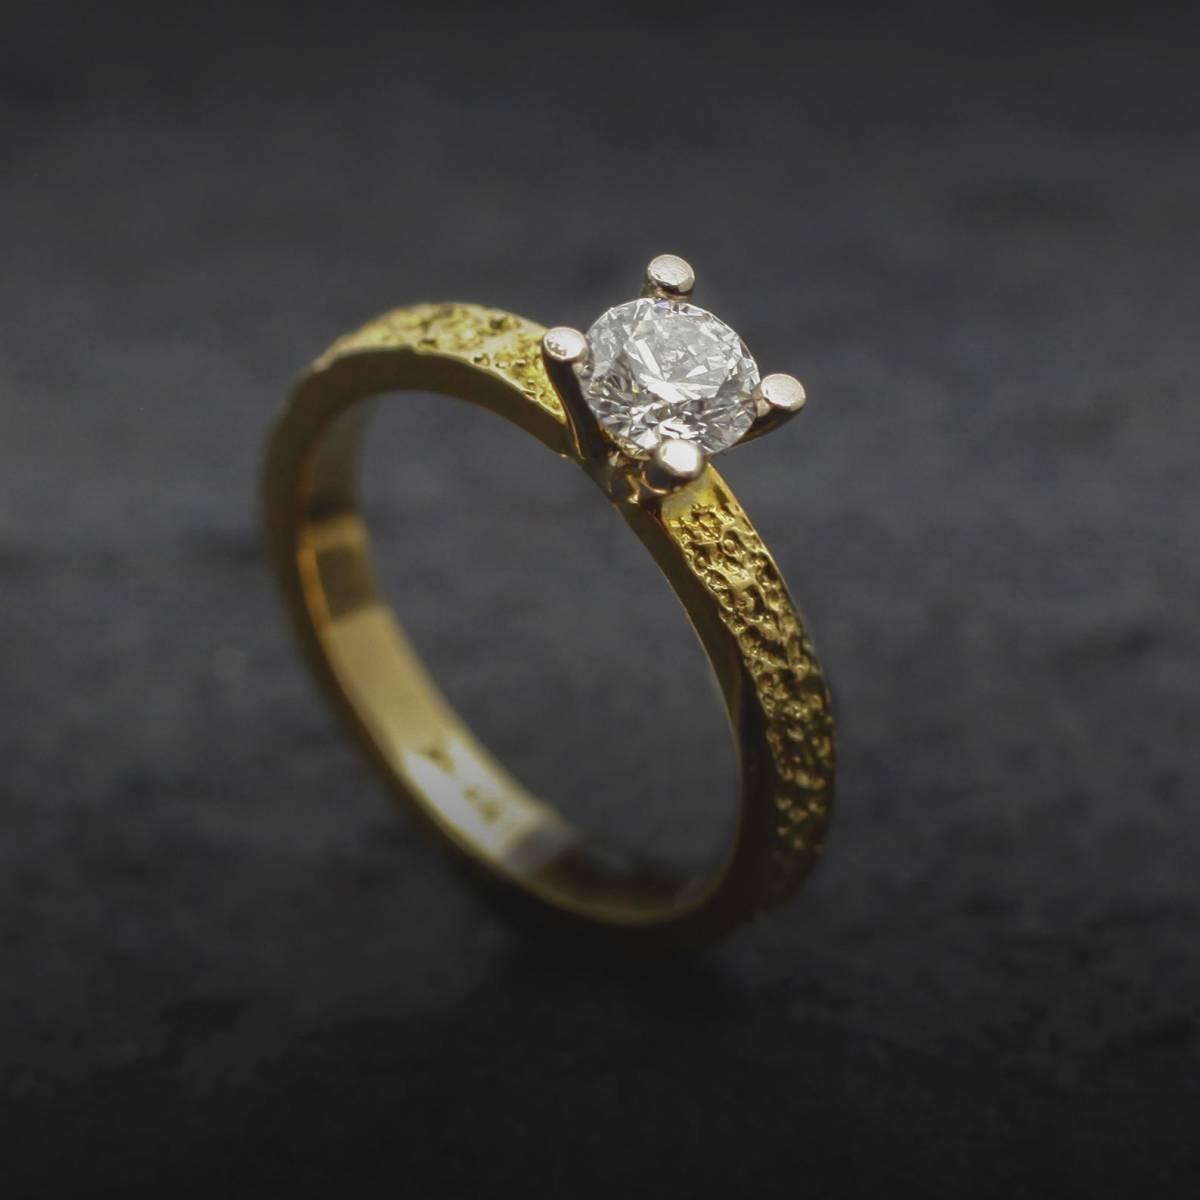 Jonas Maes Jewels - Juwelen - Bruidsjuwelen - Verlovingsring - Trouwring - House of Weddings - 19